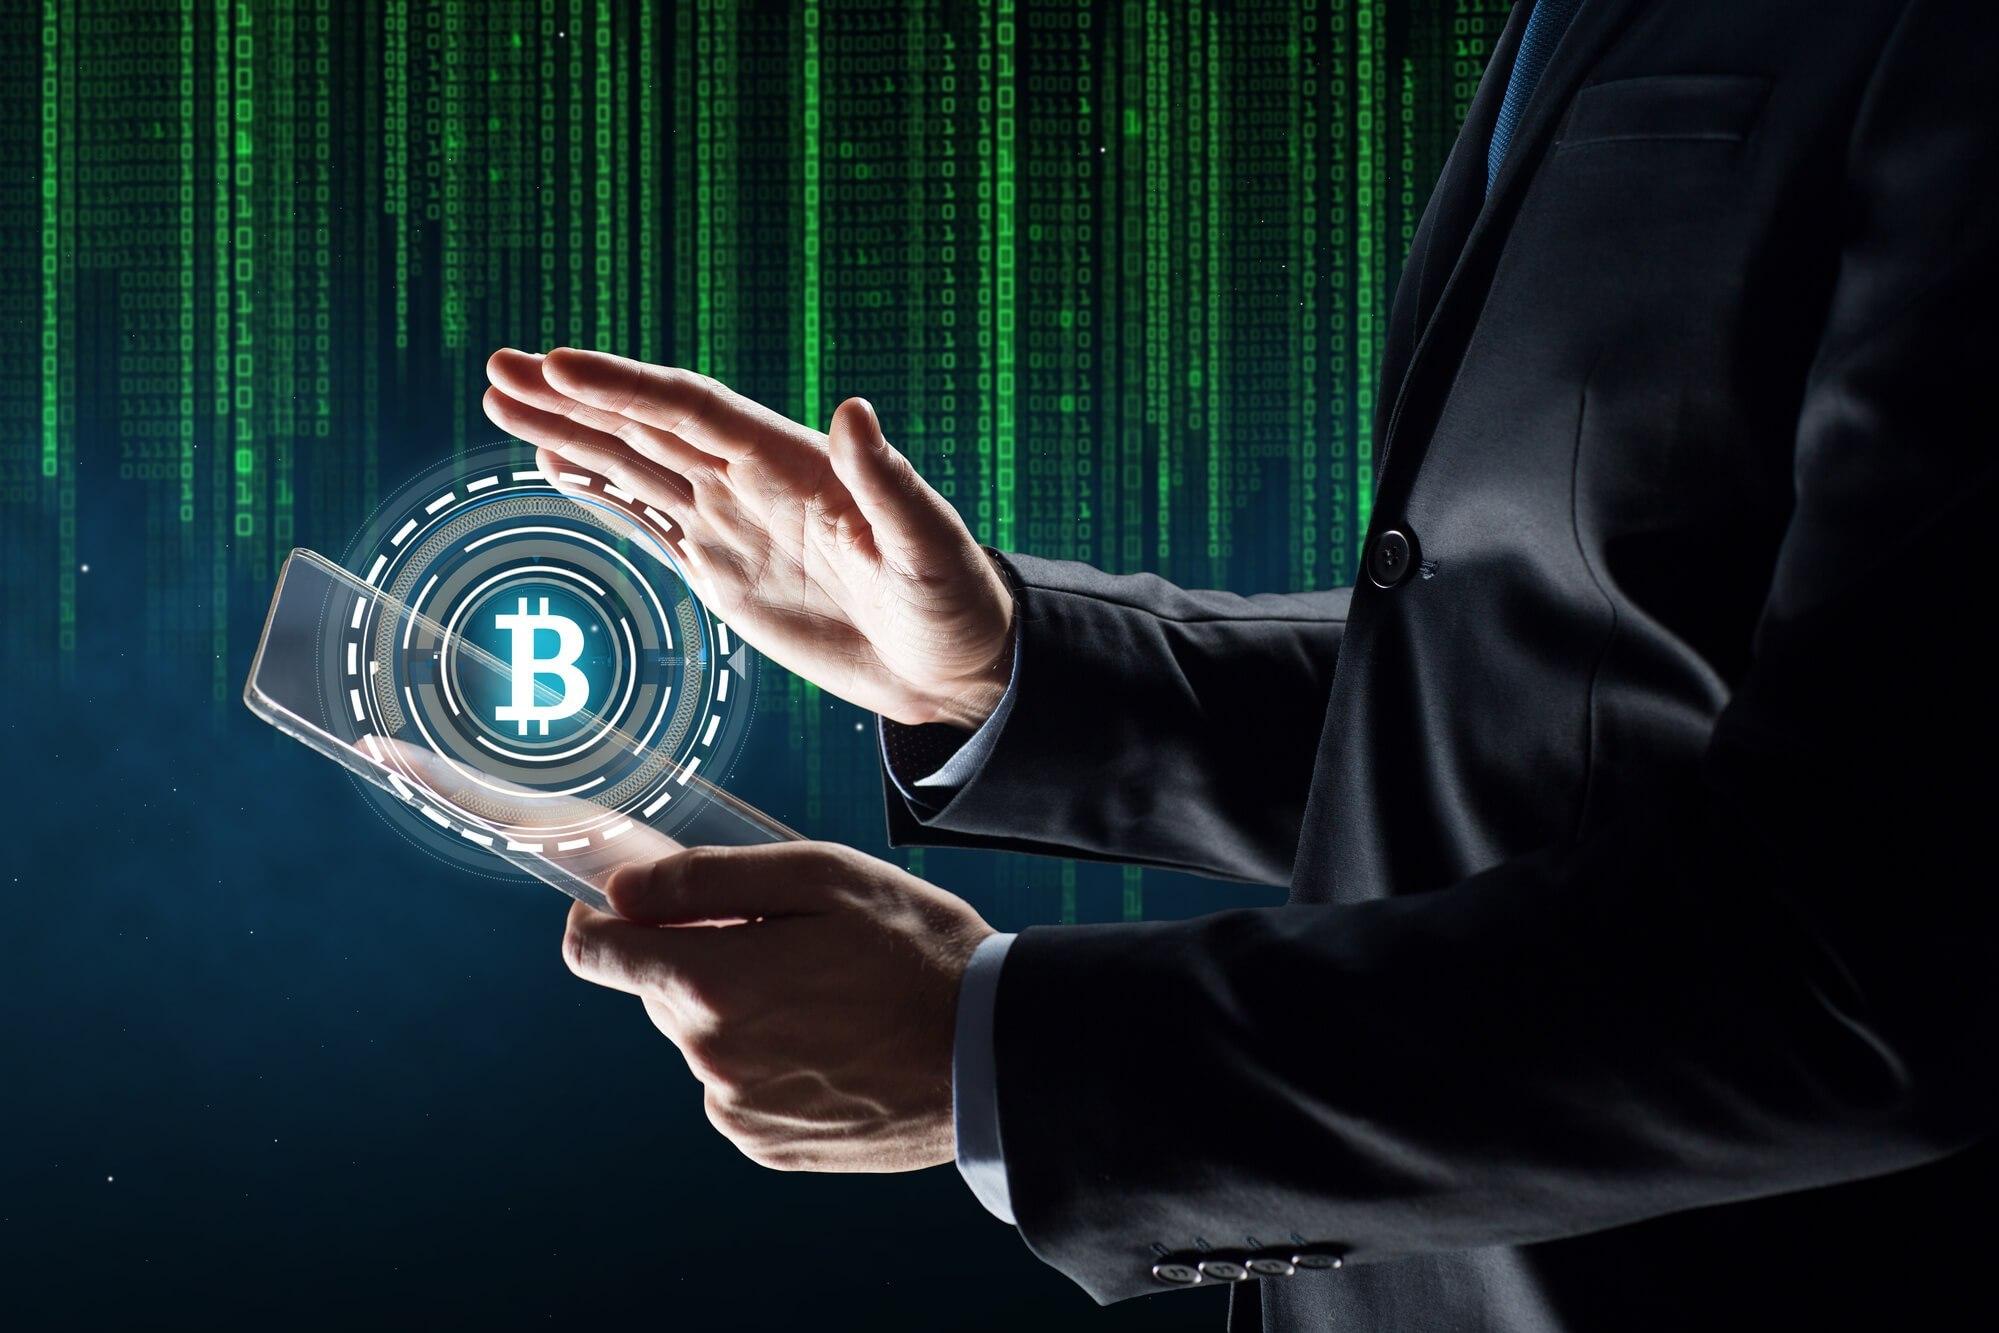 blockchain Norbert Biedrzycki change public